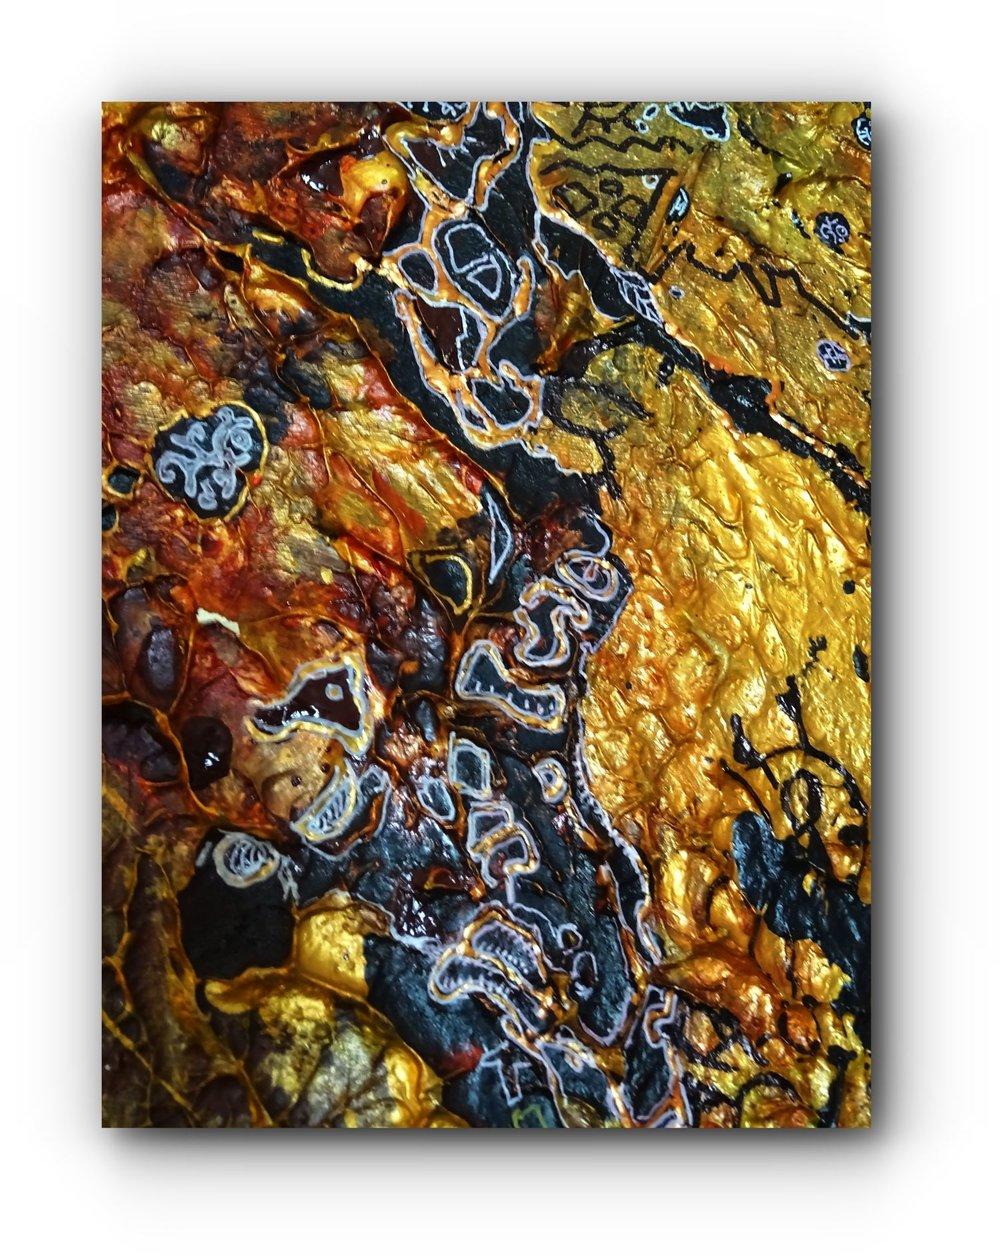 painting-detail-10-golden-sanctuary-artists-ingress-vortices.jpg